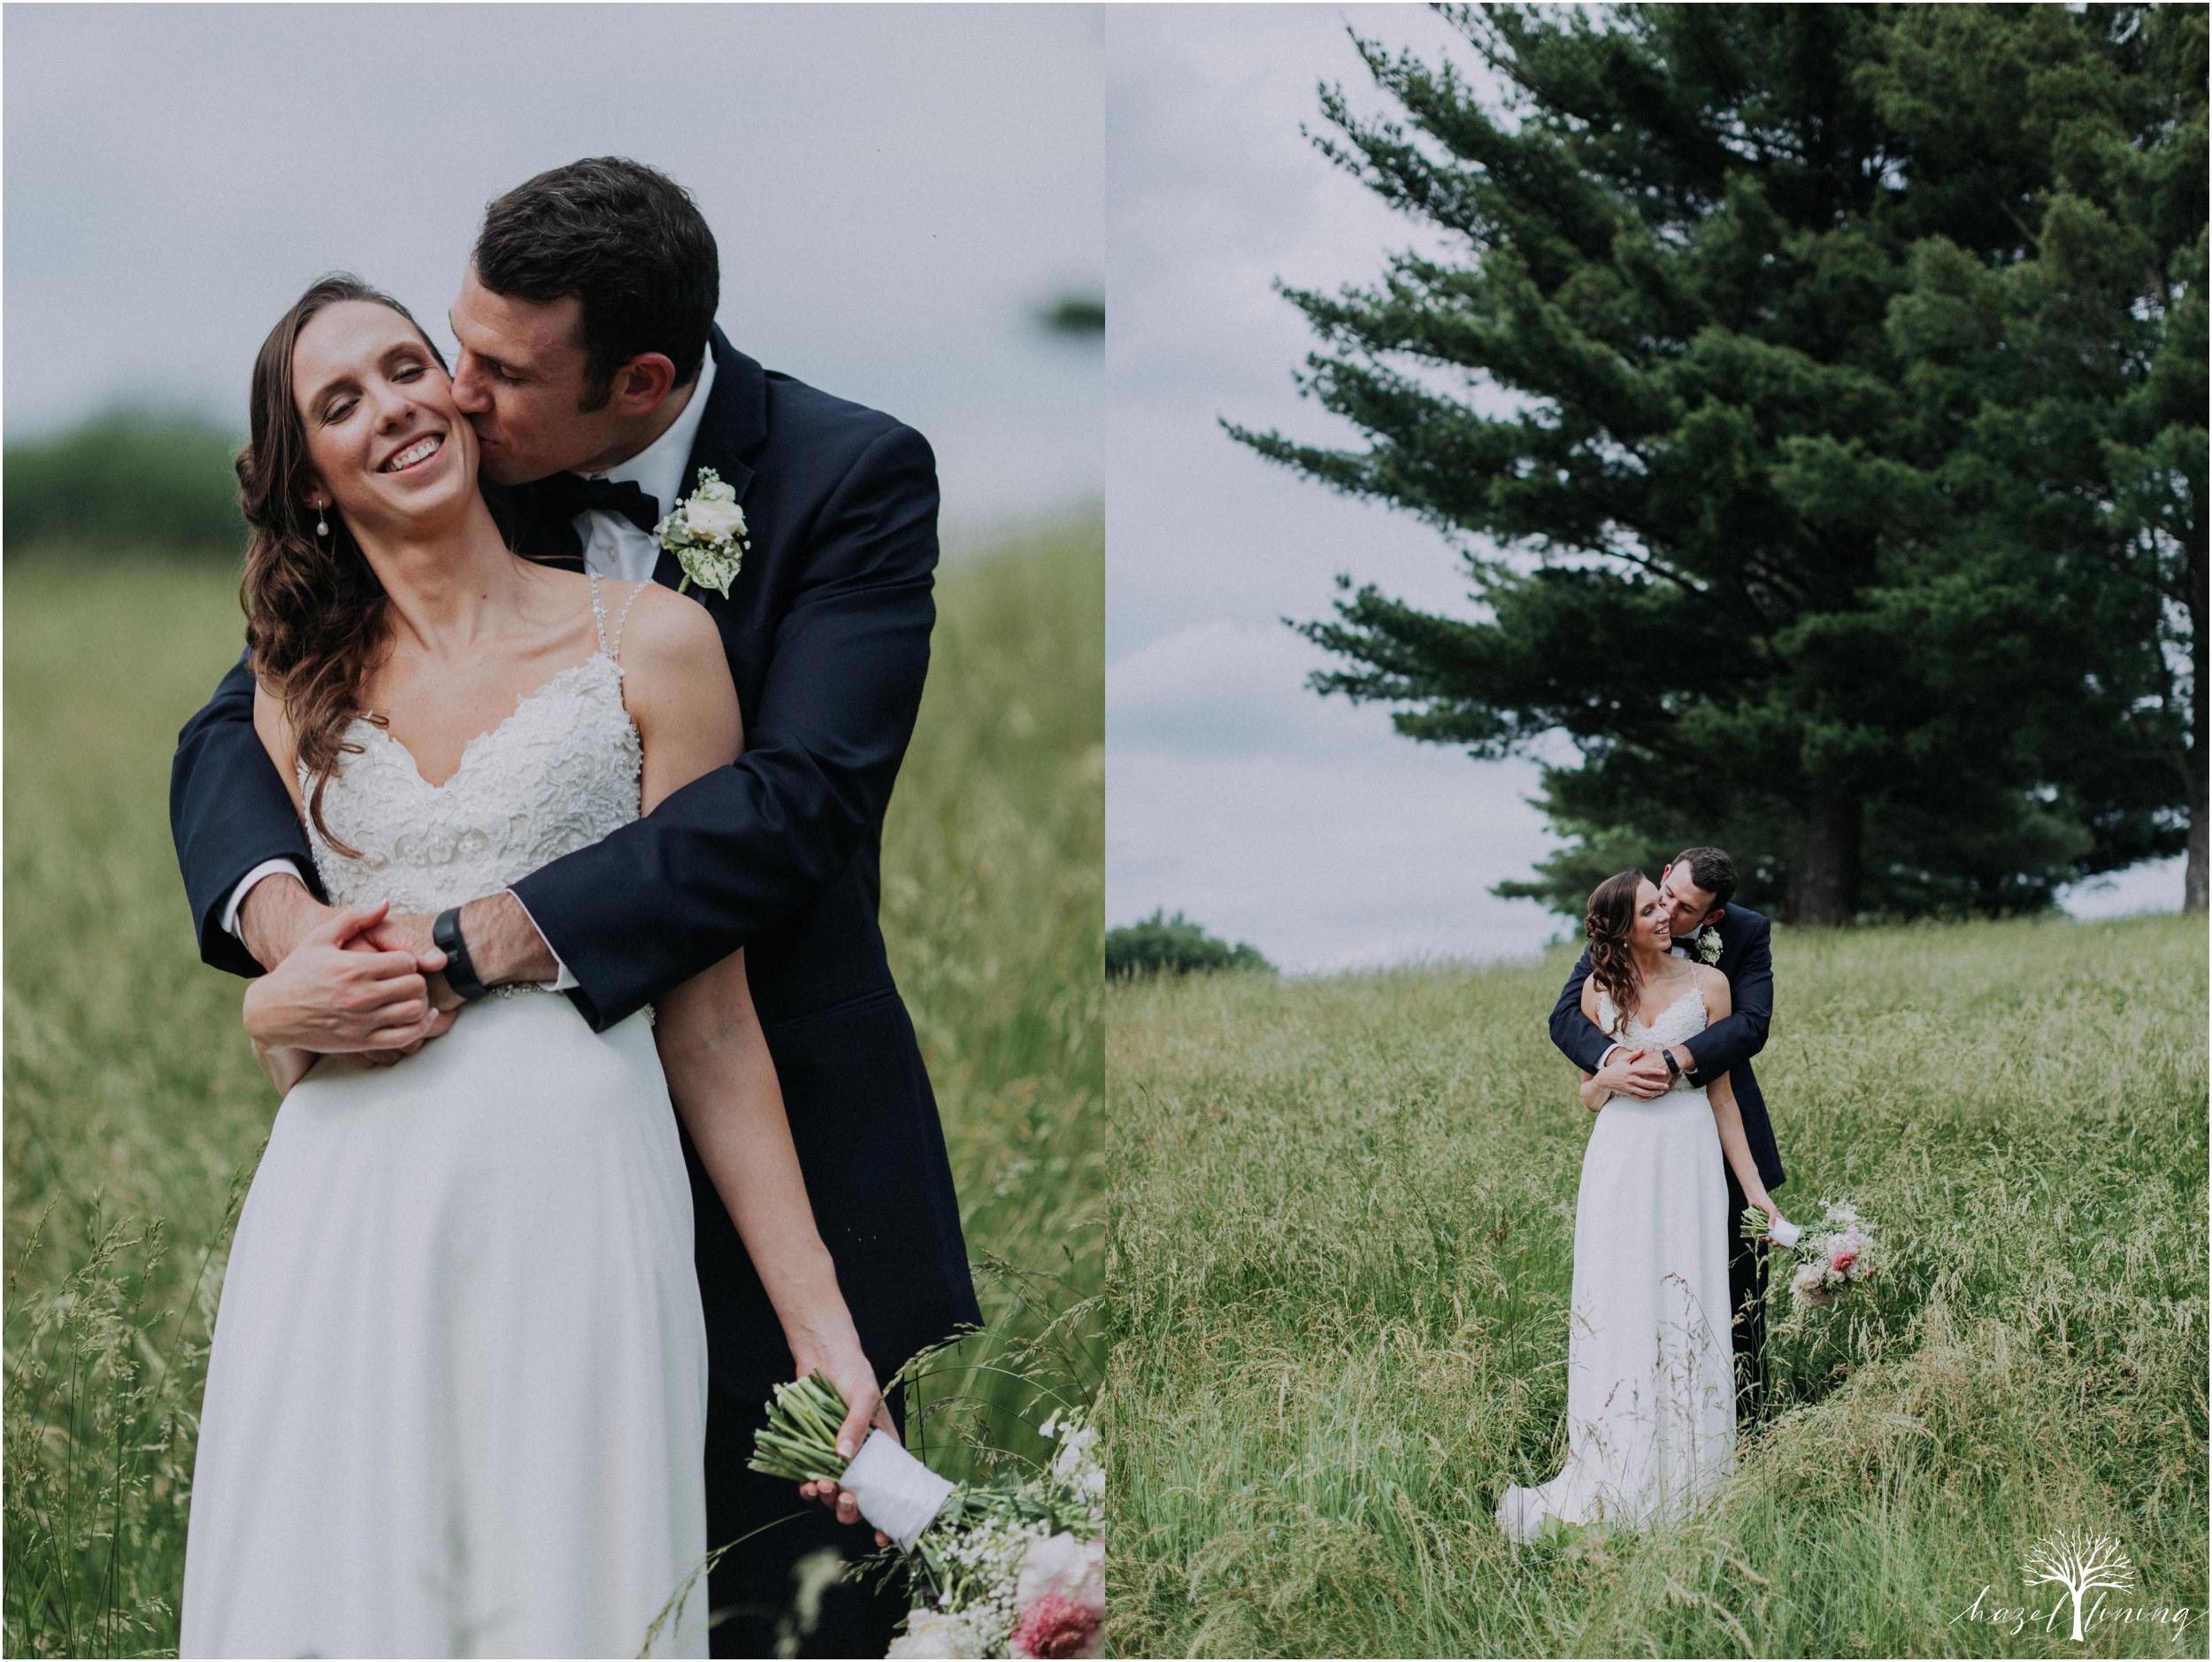 hazel-lining-travel-wedding-elopement-photography_0095.jpg